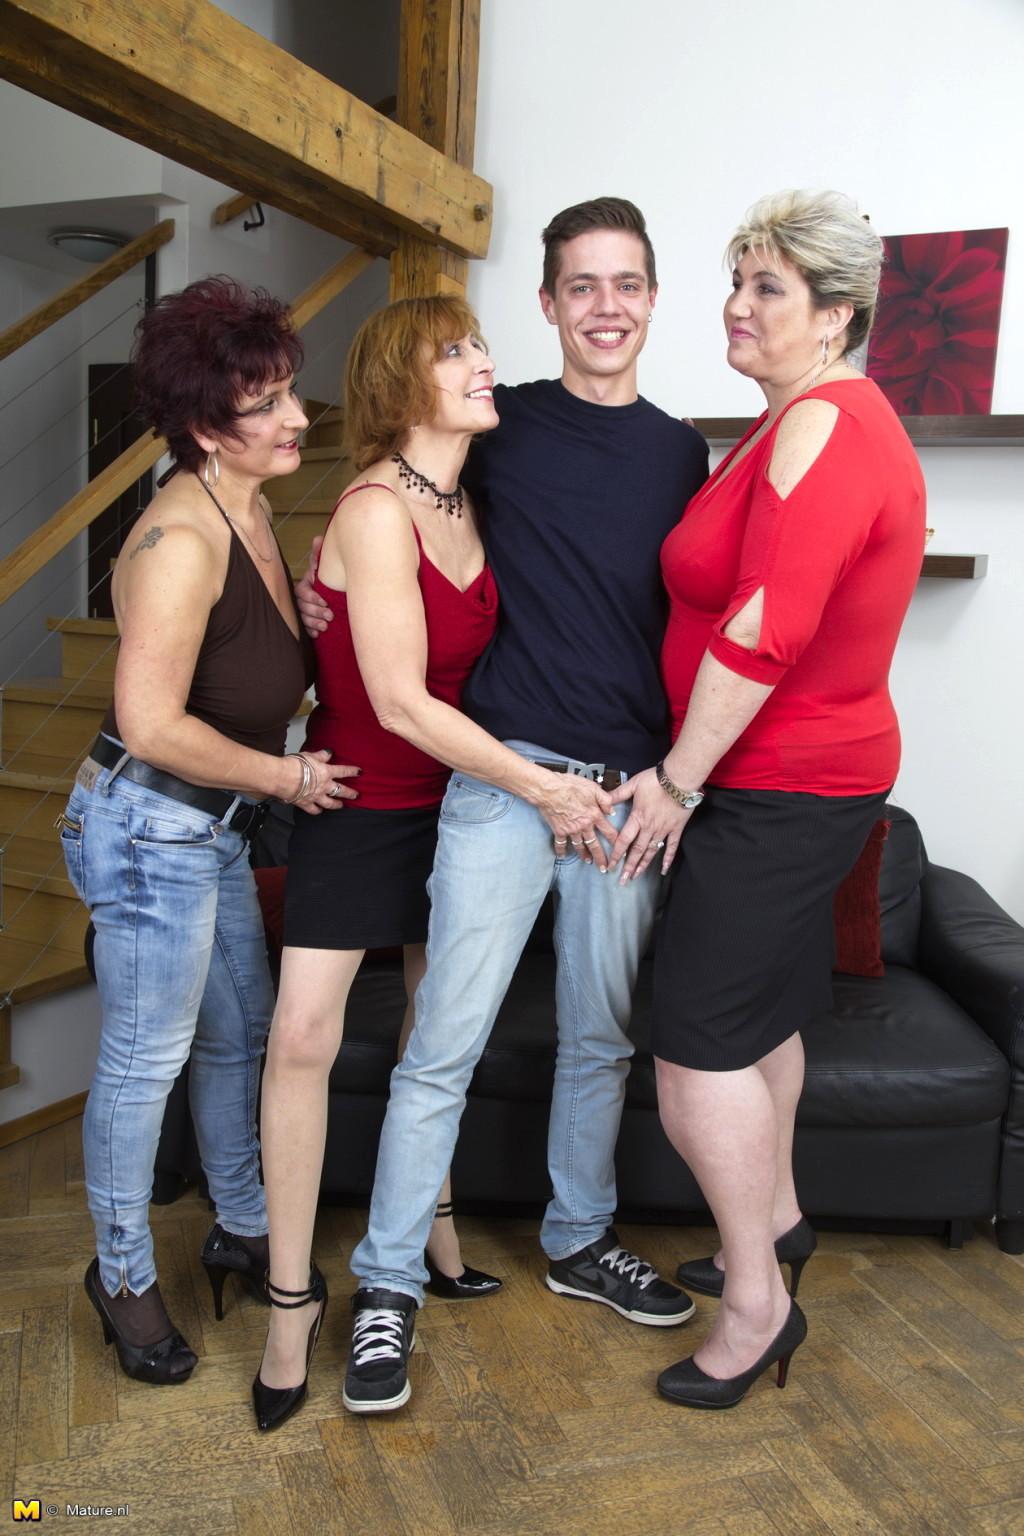 Mature Nl Maturenl Model Unlimited Group Sex Pix Sex HD Pics